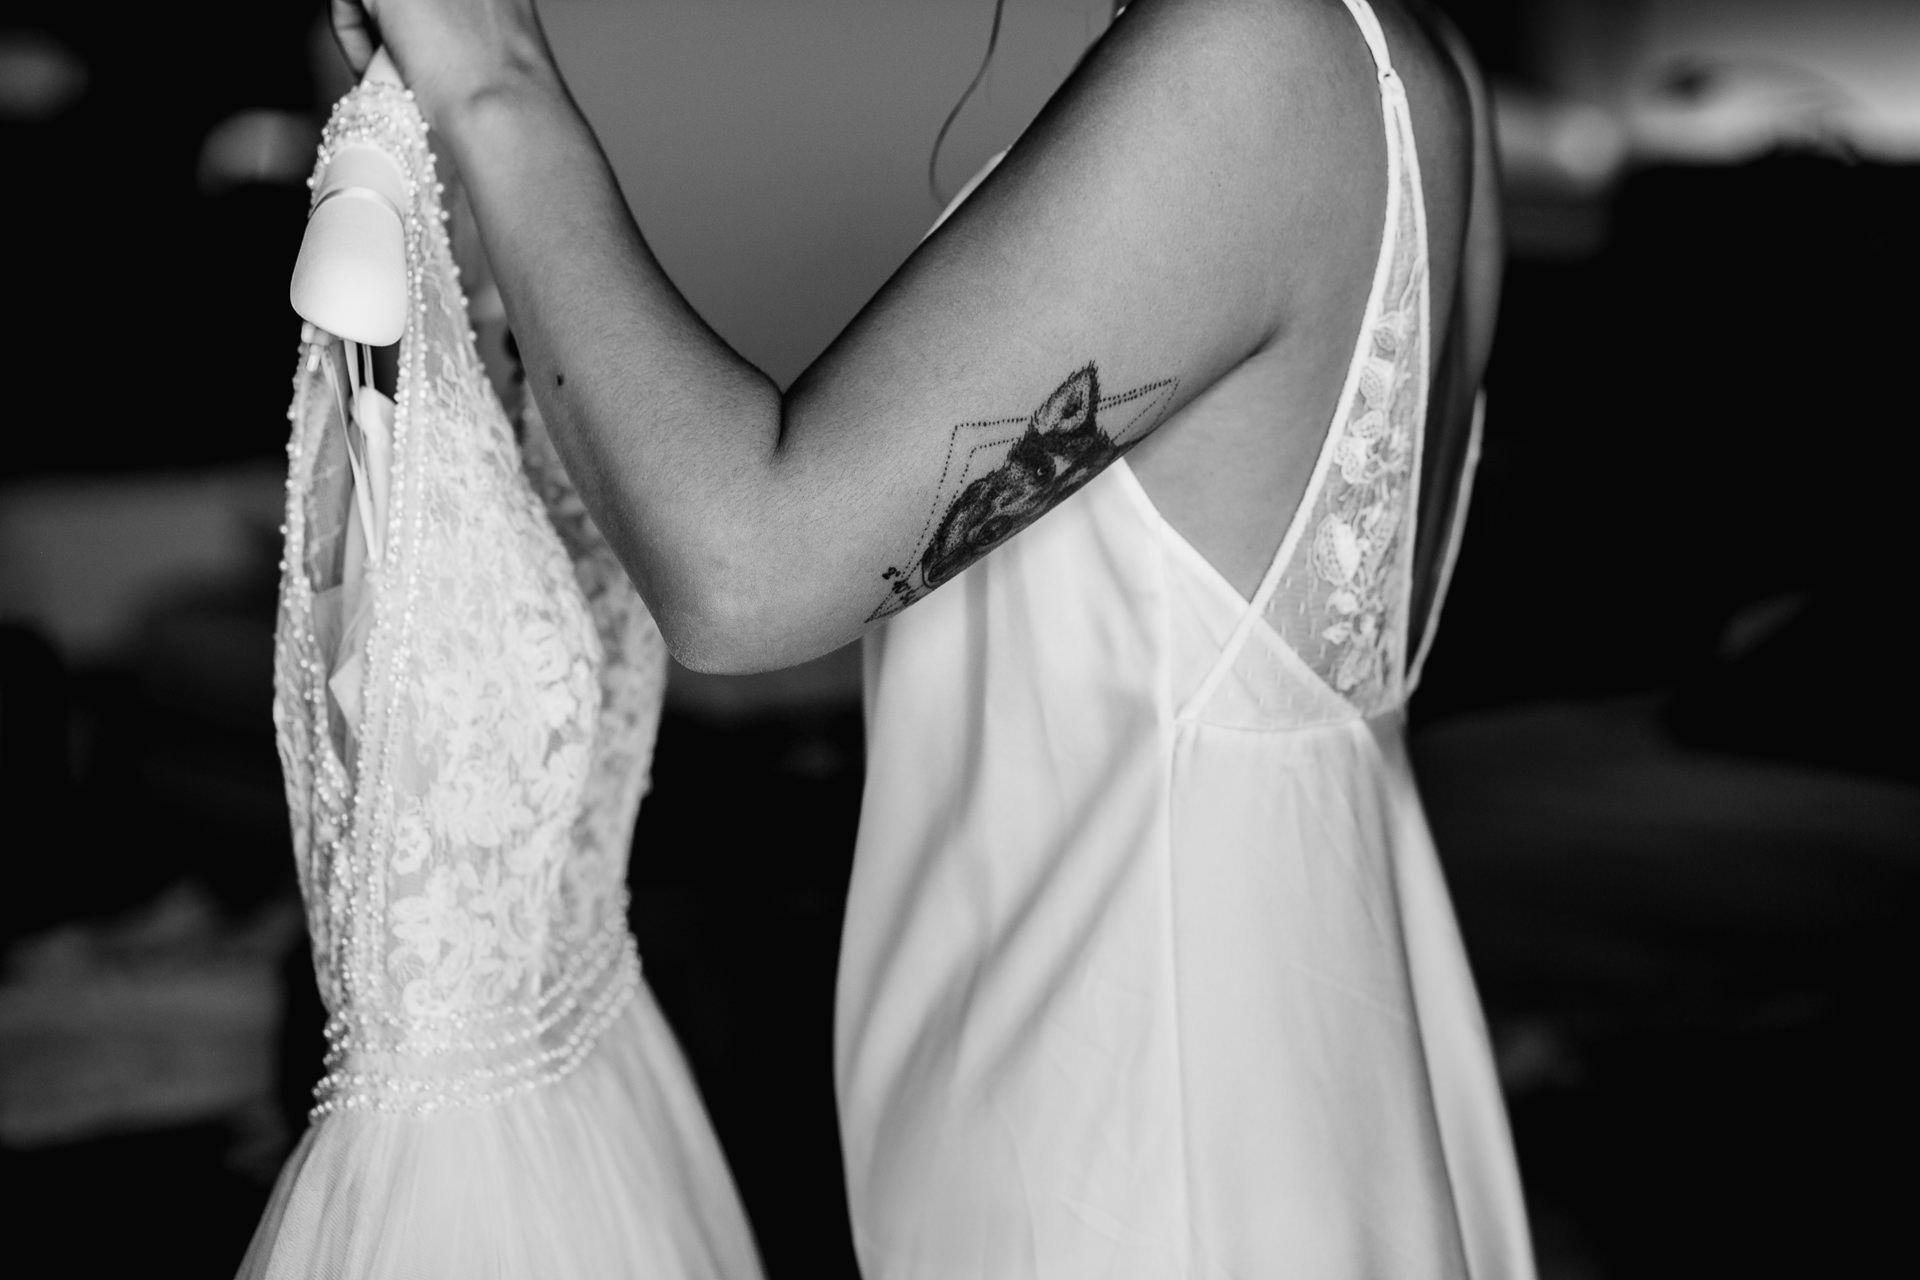 boda civil eguren ugarte larioja 130933